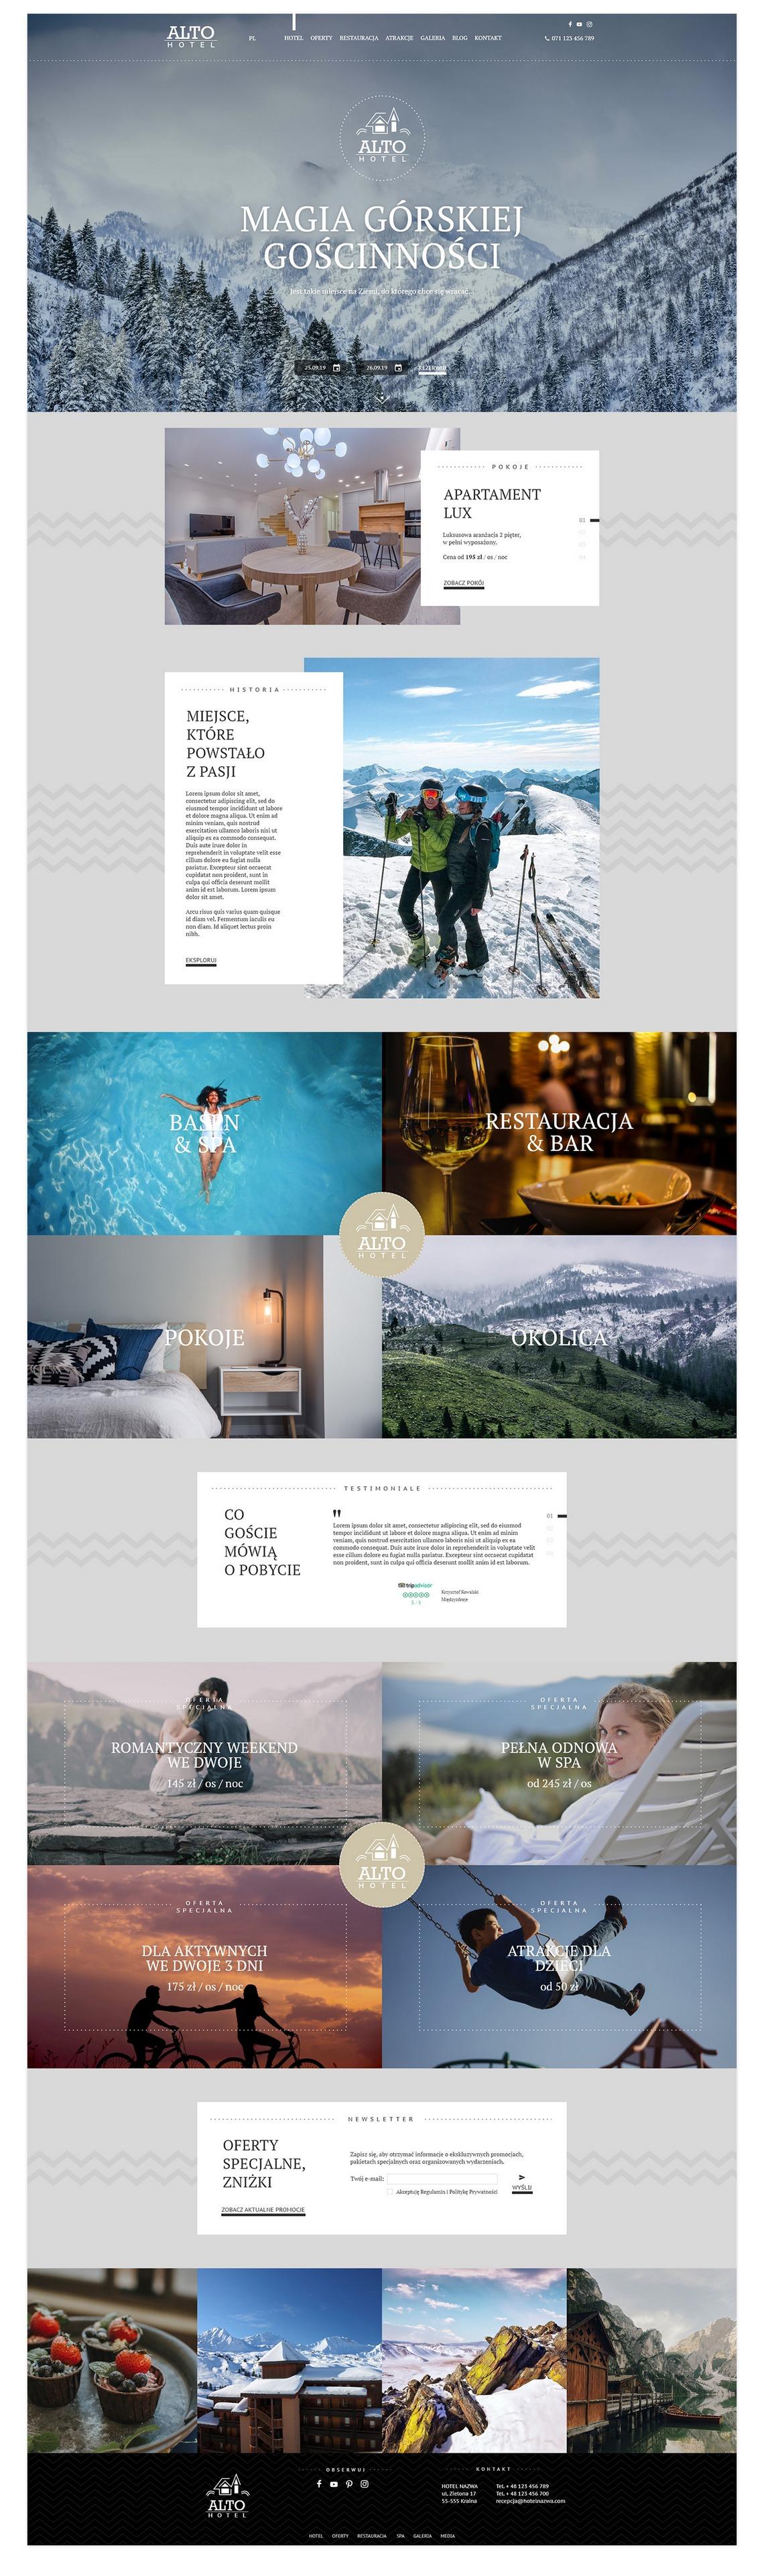 Hotel Alto Template WordPress